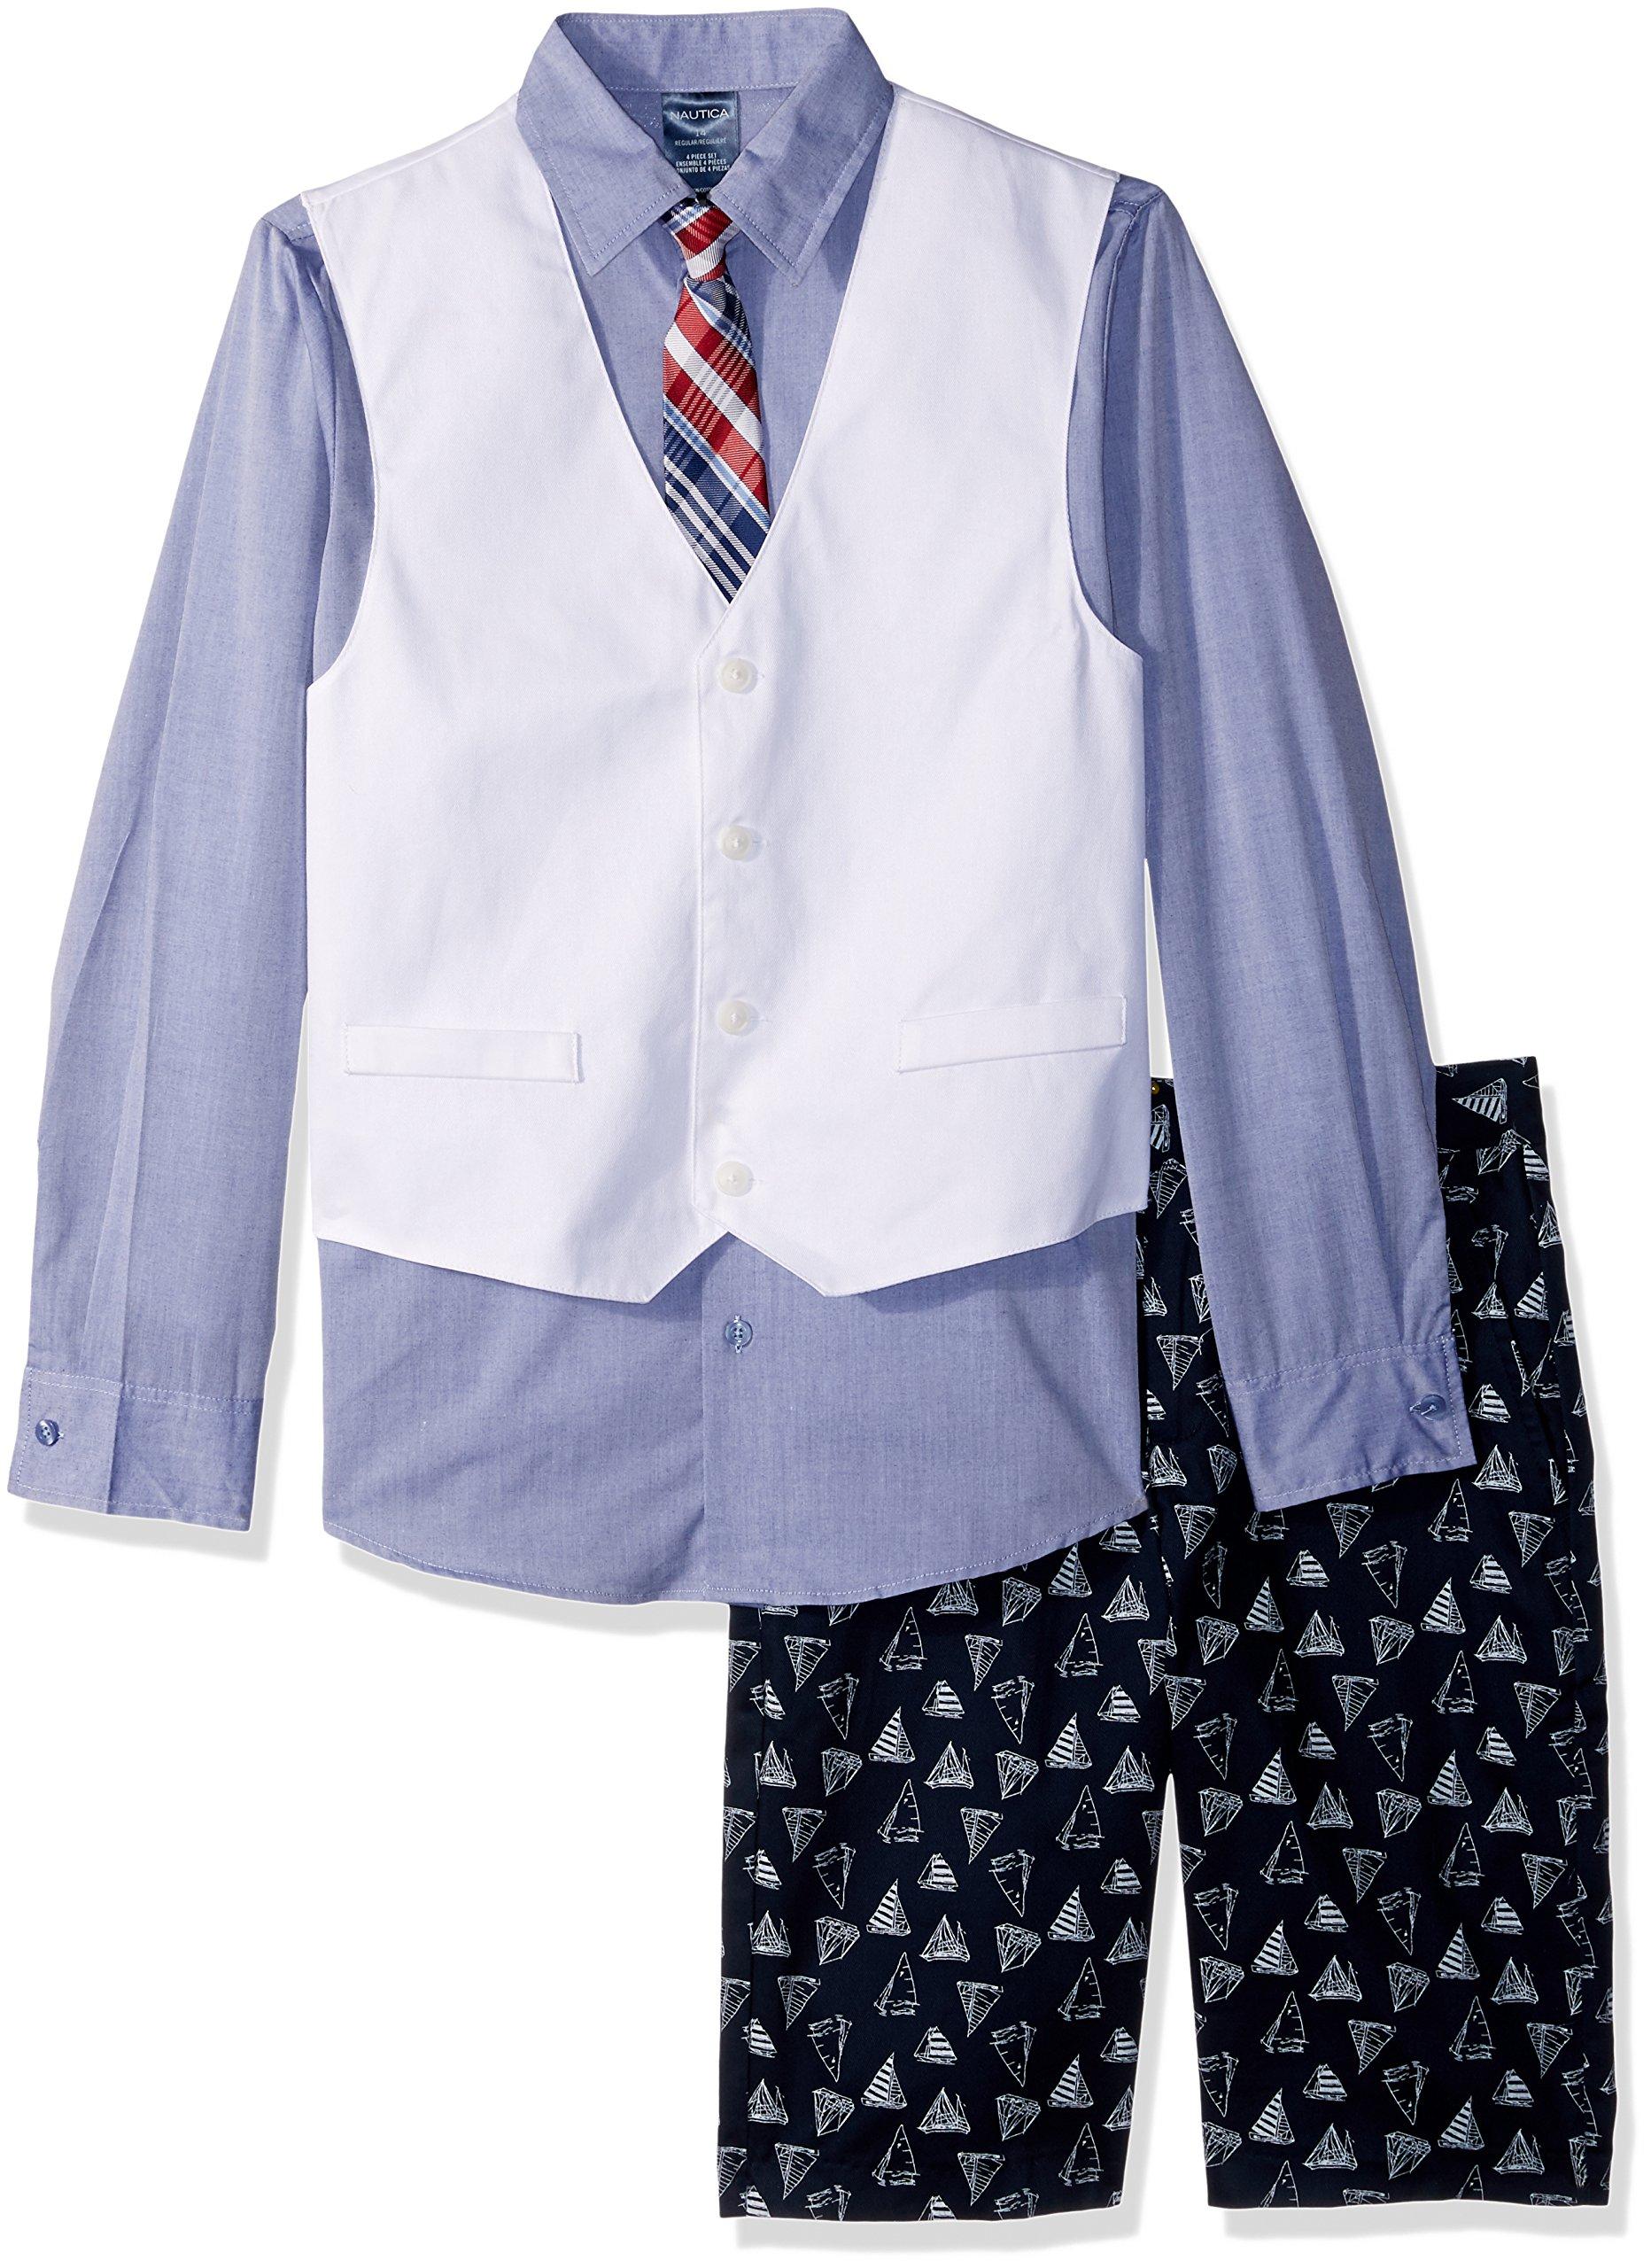 Nautica Big Boys' Set with Vest, Pant, Shirt, and Tie, Sailboat White, 16